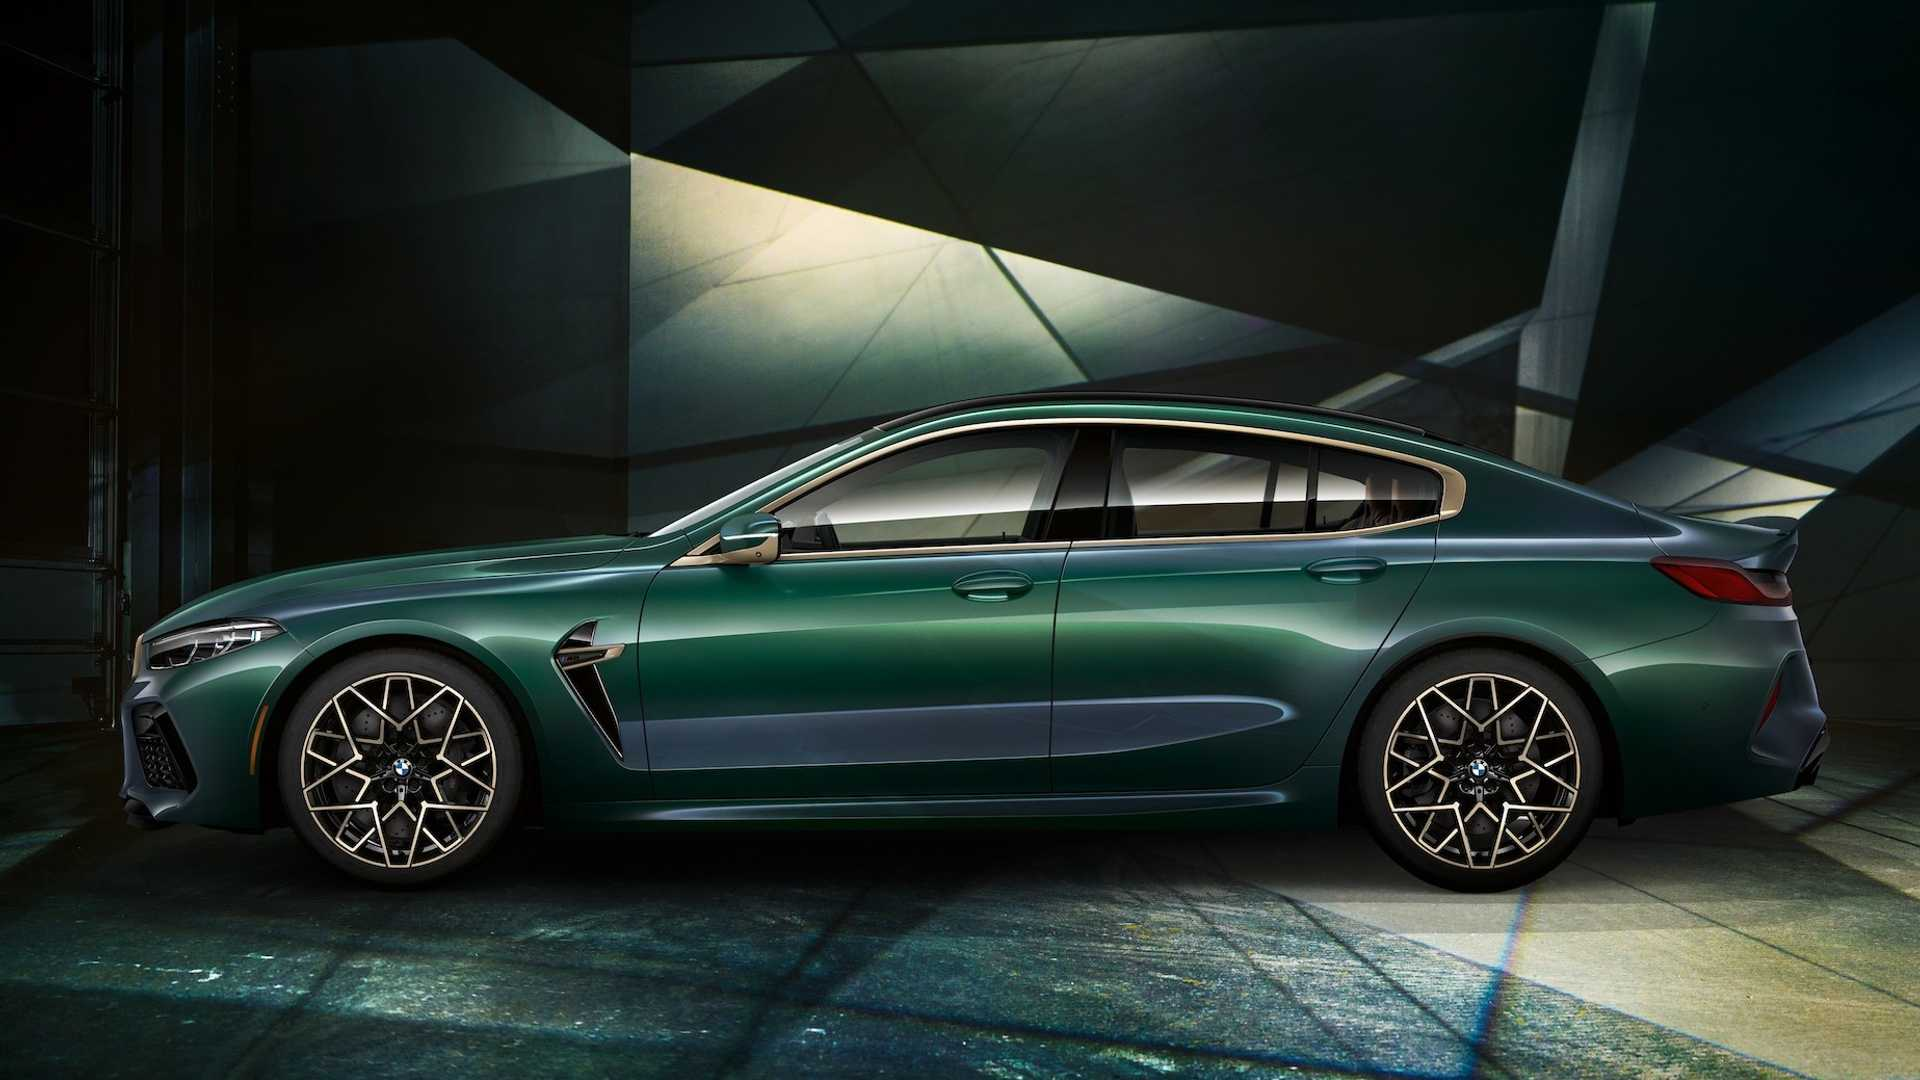 2020-bmw-m8-gran-coupe-8.jpg